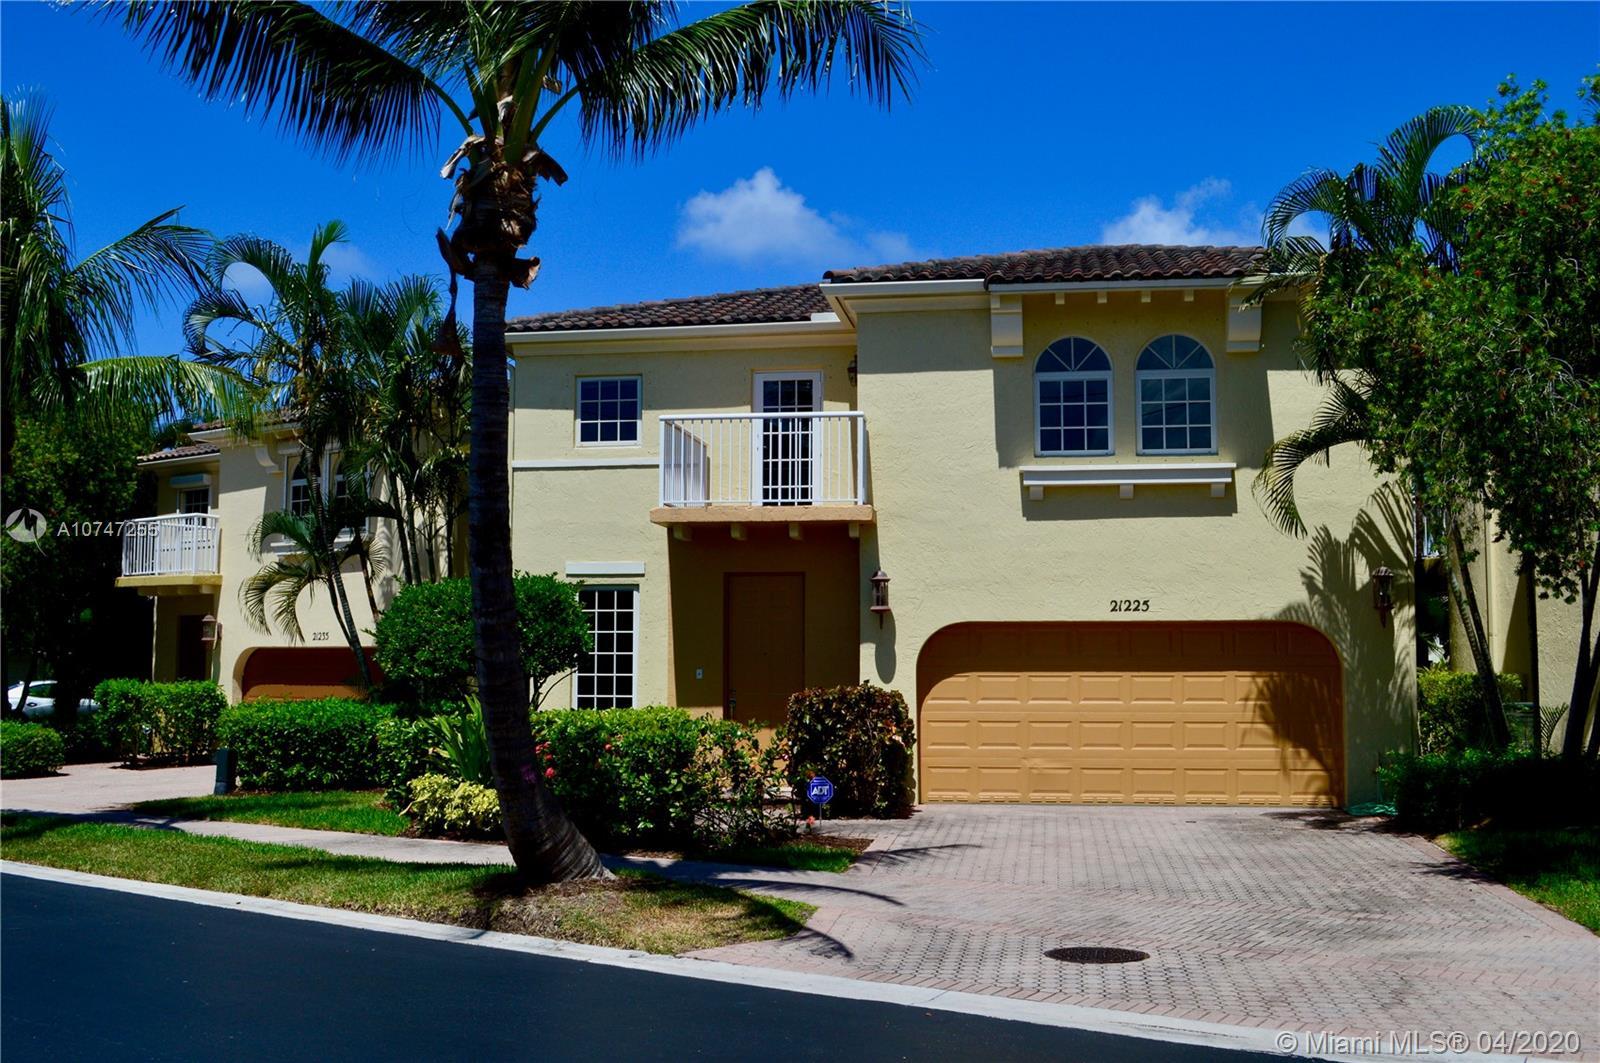 21225 NE 31st Ave, Aventura, FL 33180 - Aventura, FL real estate listing